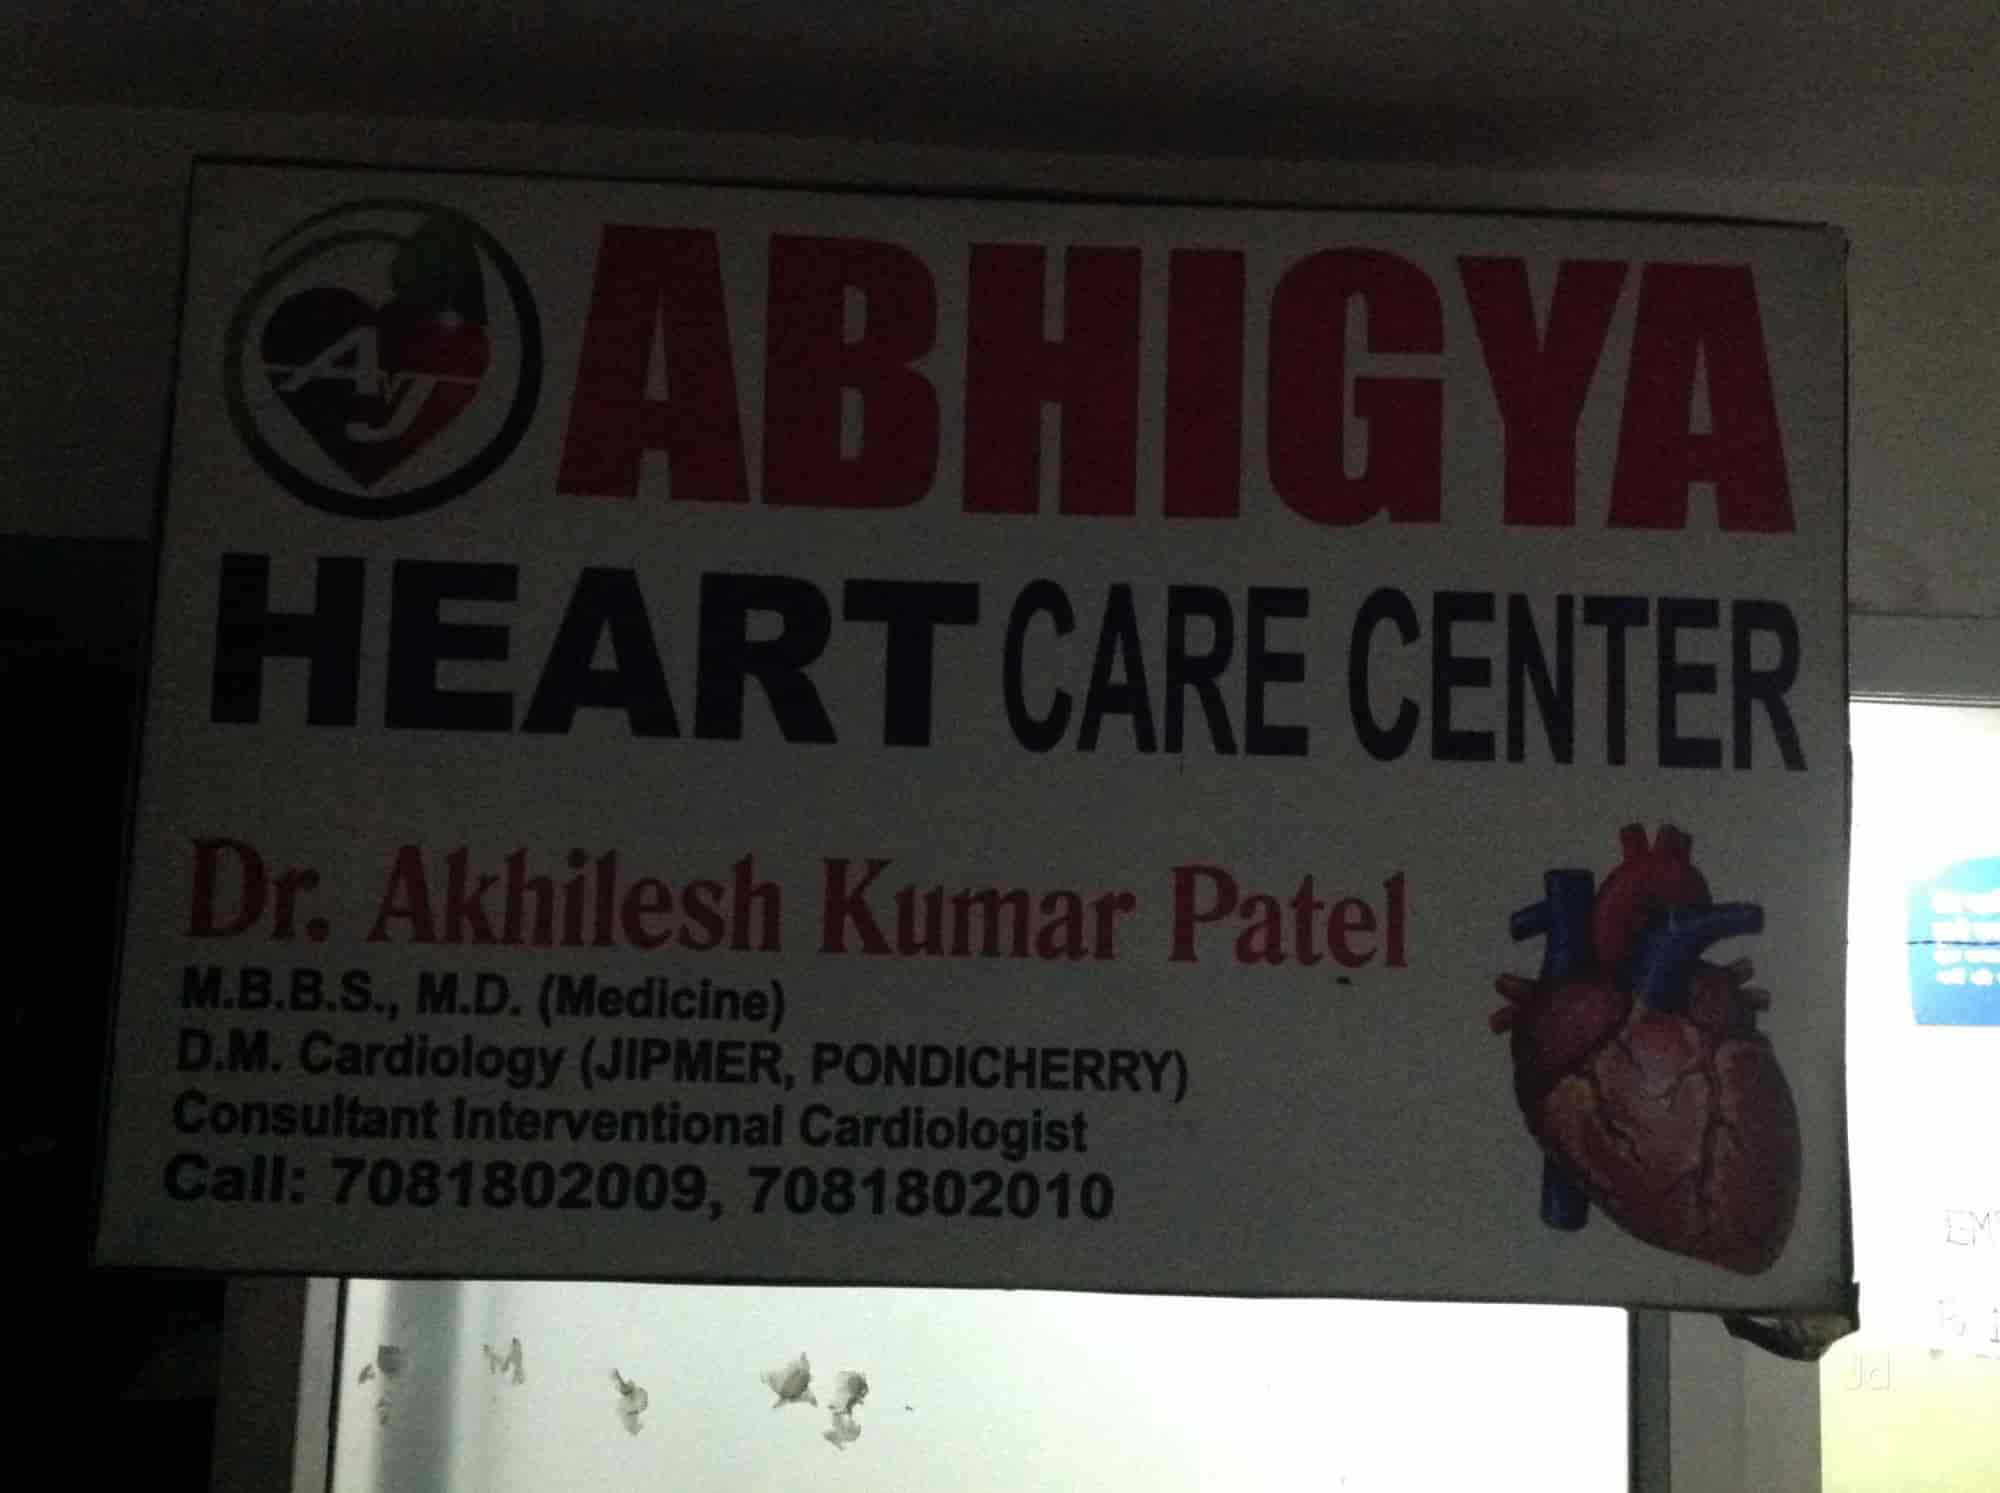 Abhigya Heart Care Center - Dr Akhilesh Kumar Patel